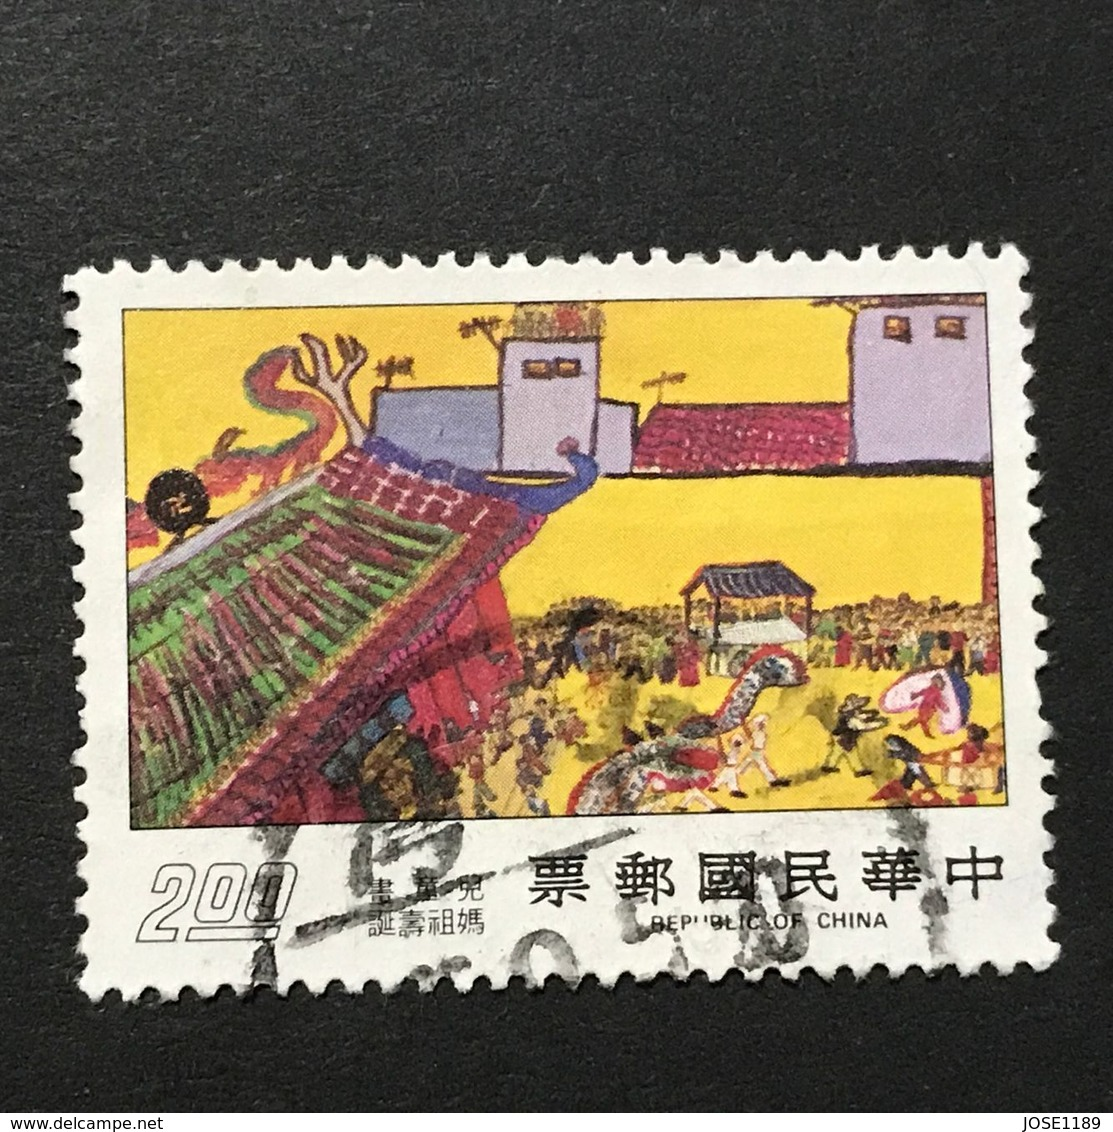 ◆◆◆Taiwán (Formosa)  1977  8th Exhib. Of World School Children's Art.     $2   USED   AA2335 - 1945-... República De China